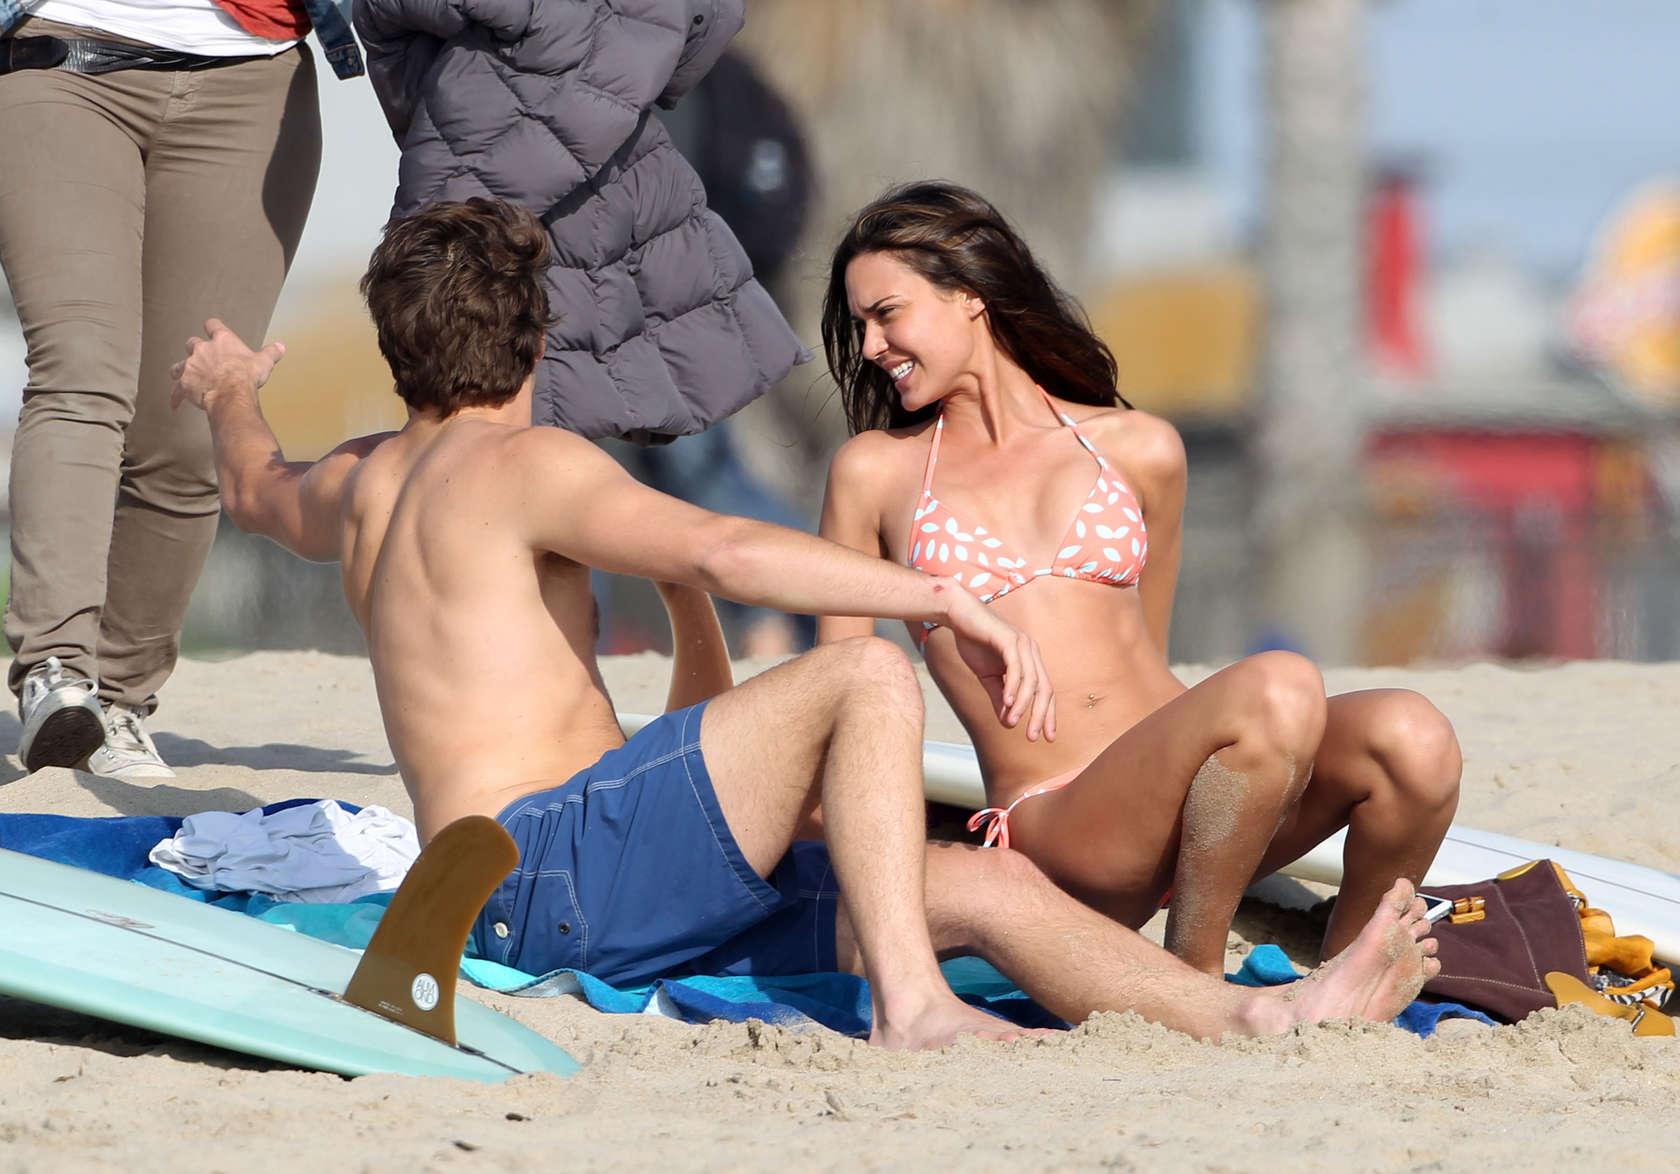 Odette Annable 2013 : Odette Annable bikini candids on the set of Westside-26